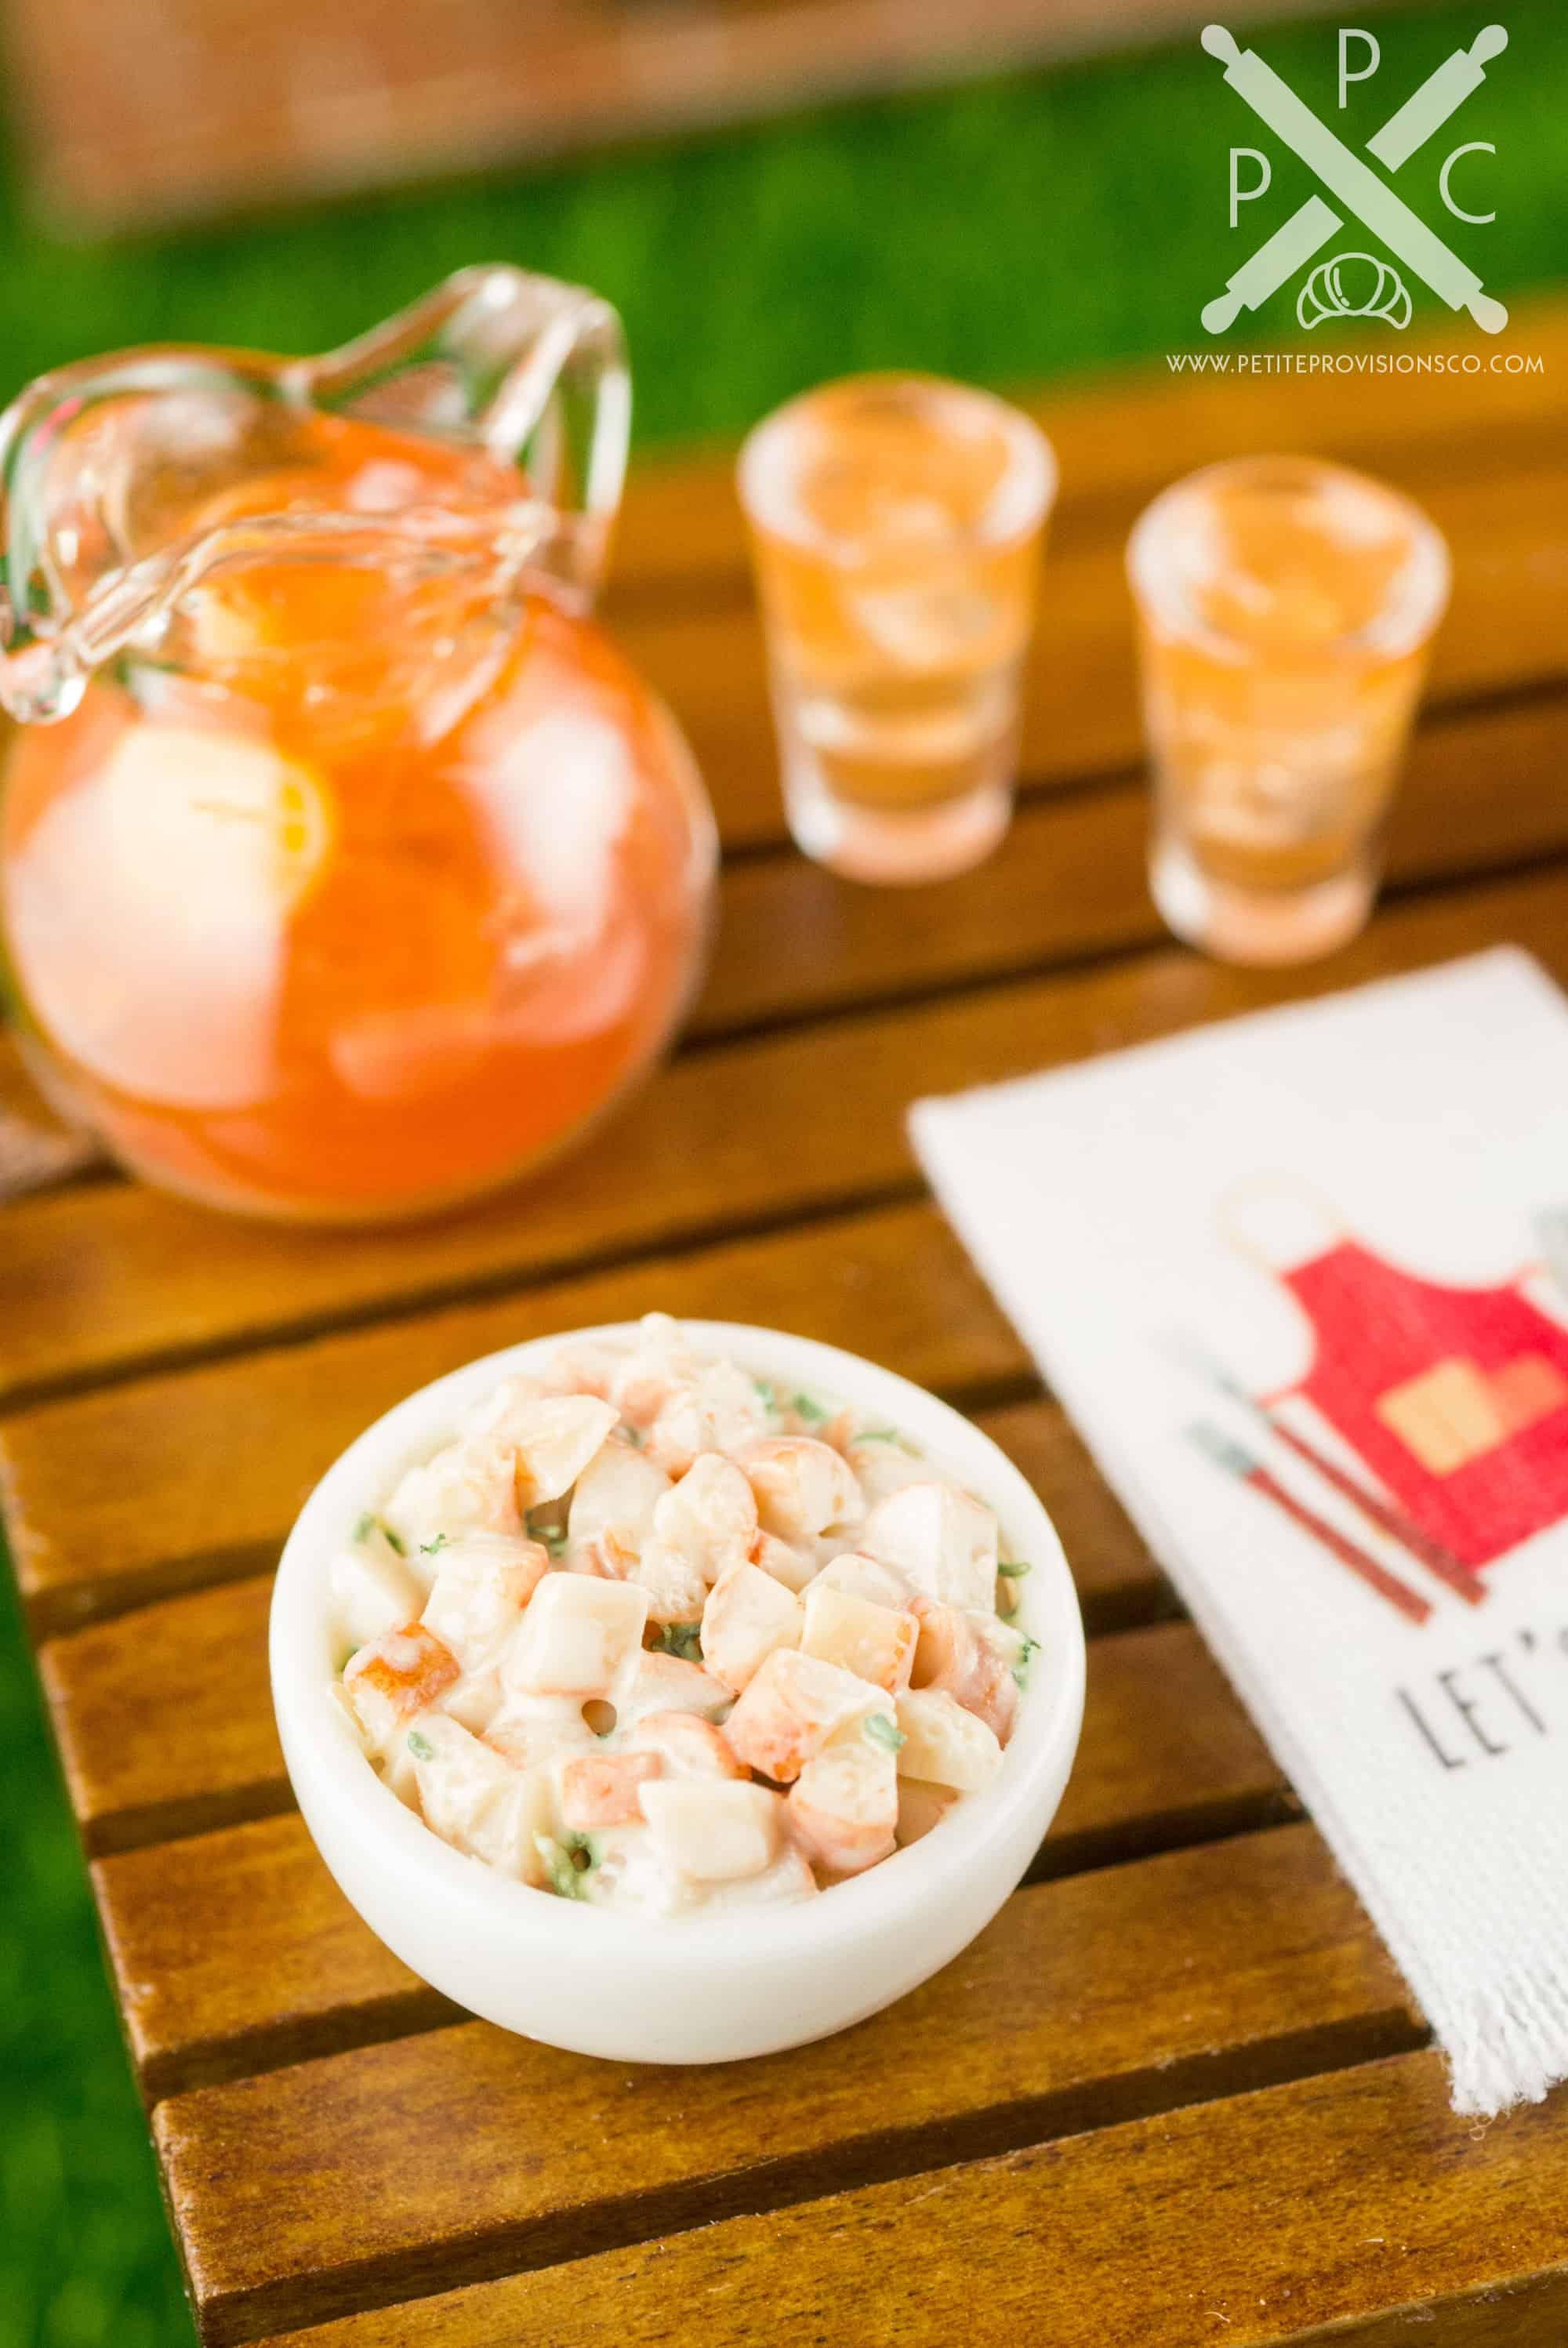 1:12 Dollhouse Miniature Salad in Bowl// Miniature Meal